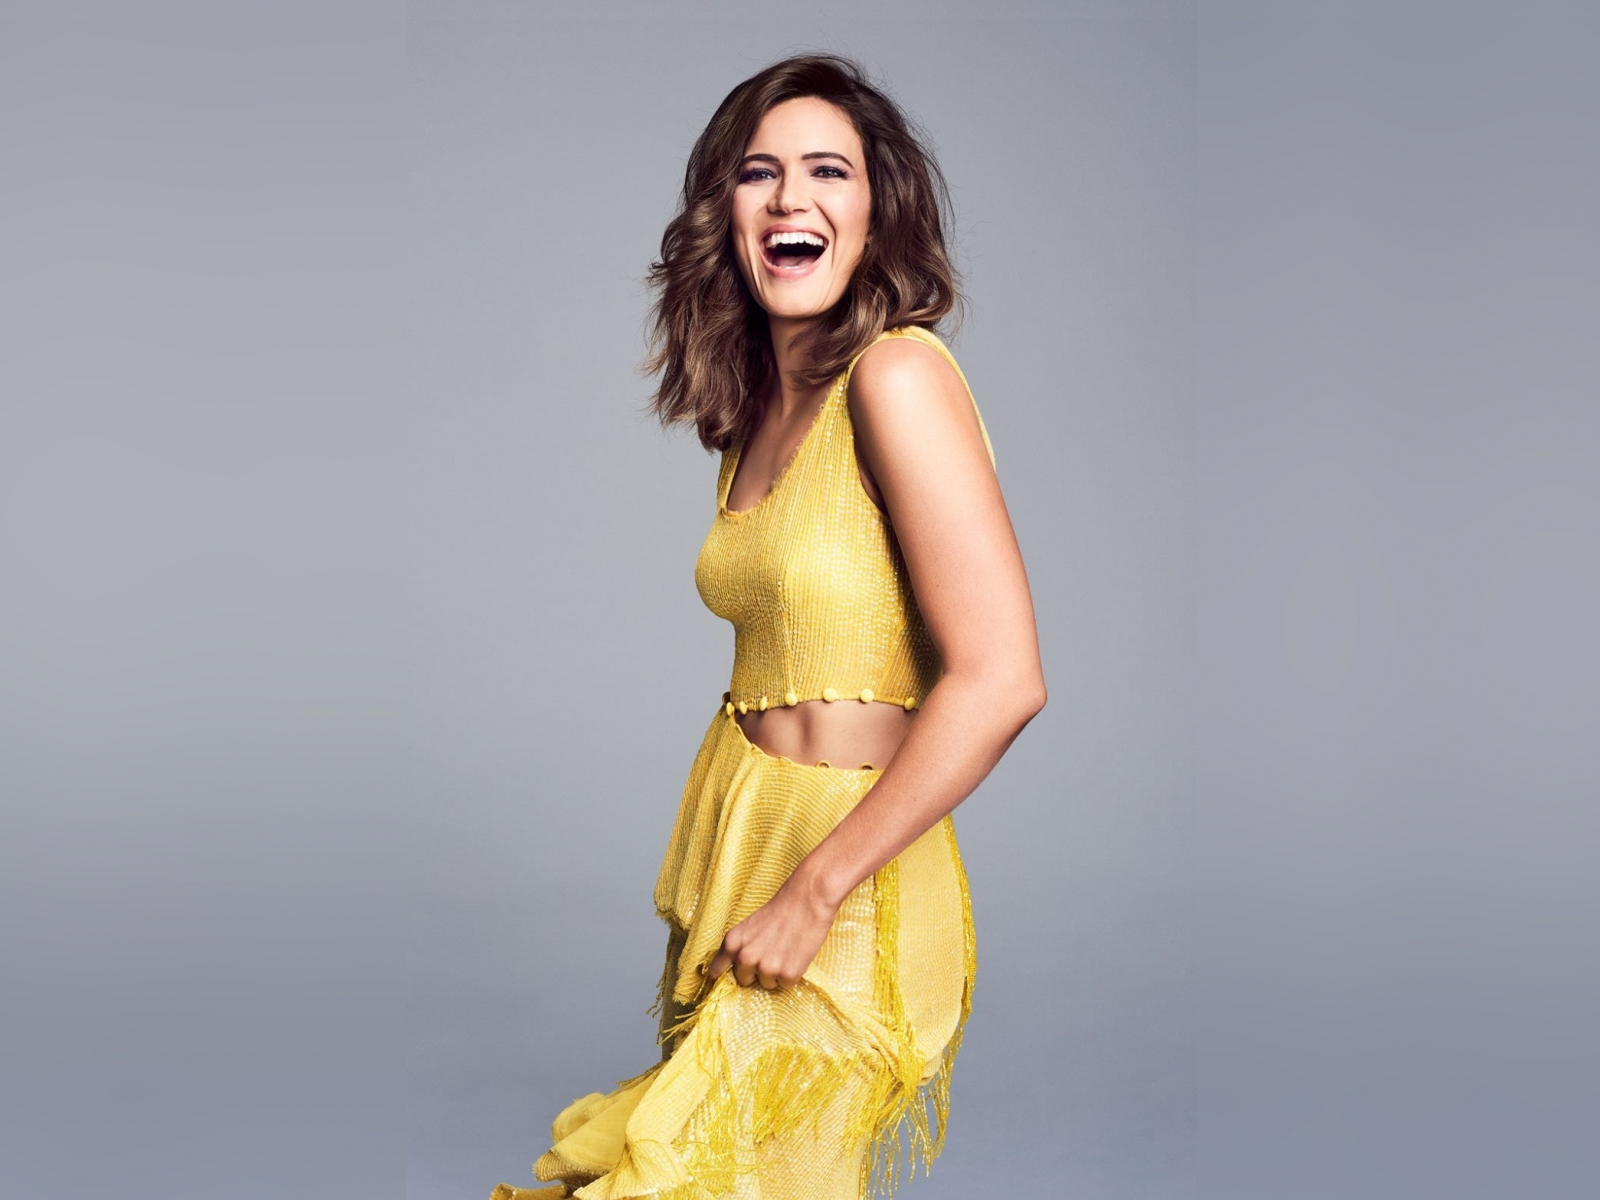 download 1600x1200 wallpaper mandy moore, yellow dress, smile, 2018